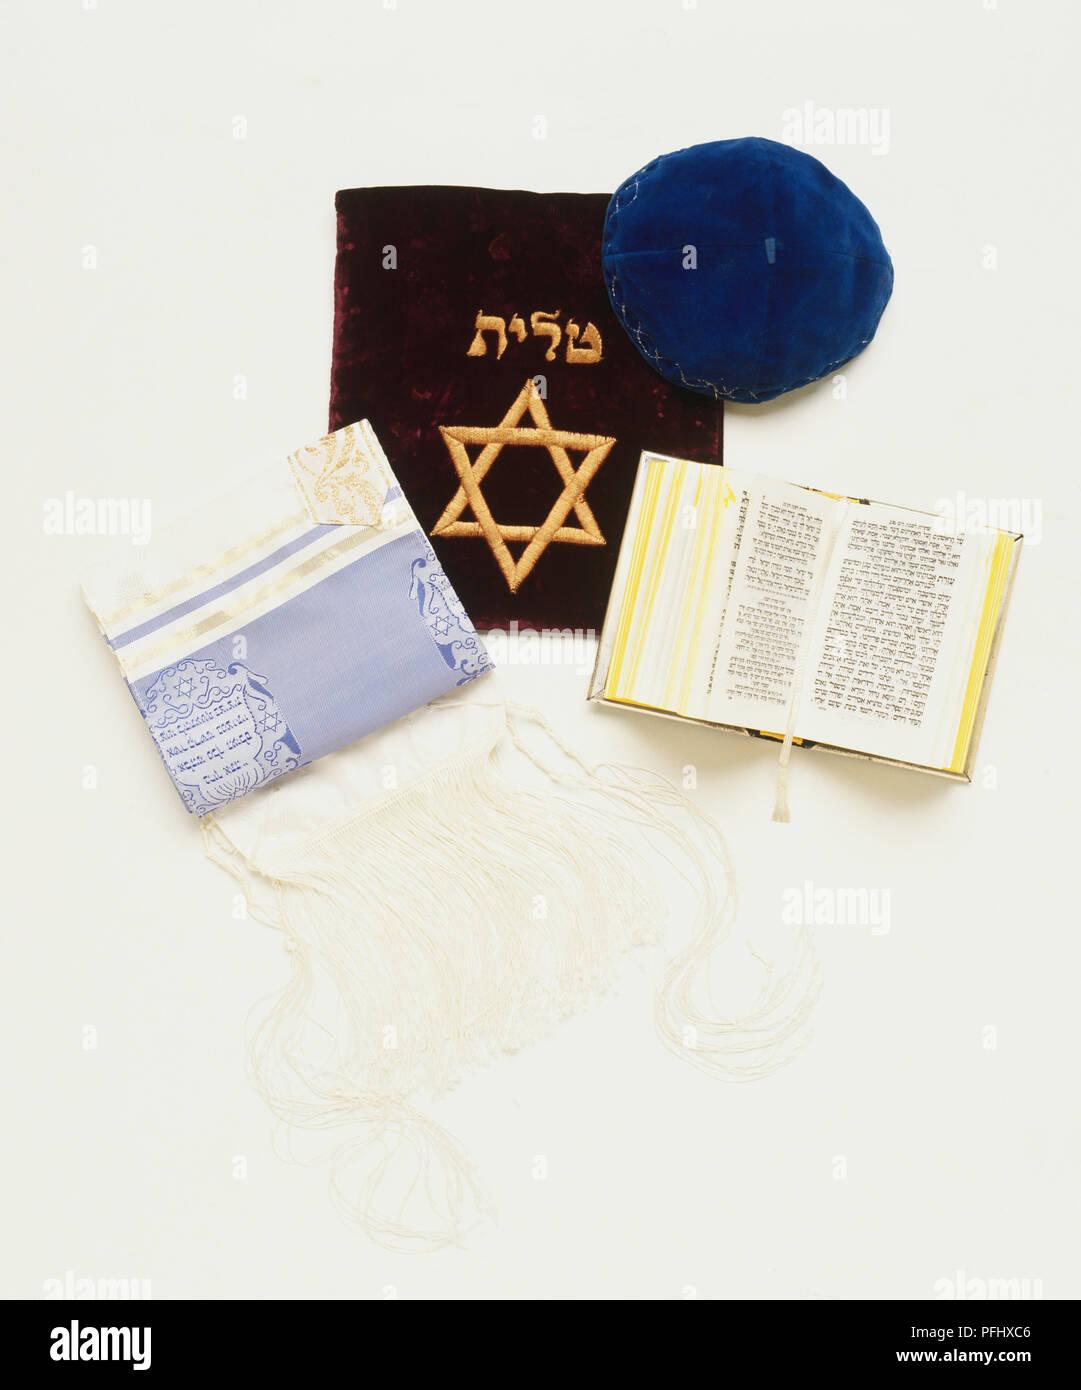 Blue skull-cap, Jewish prayer shawl and embroidered shawl bag, Hebrew prayer book, front view. - Stock Image